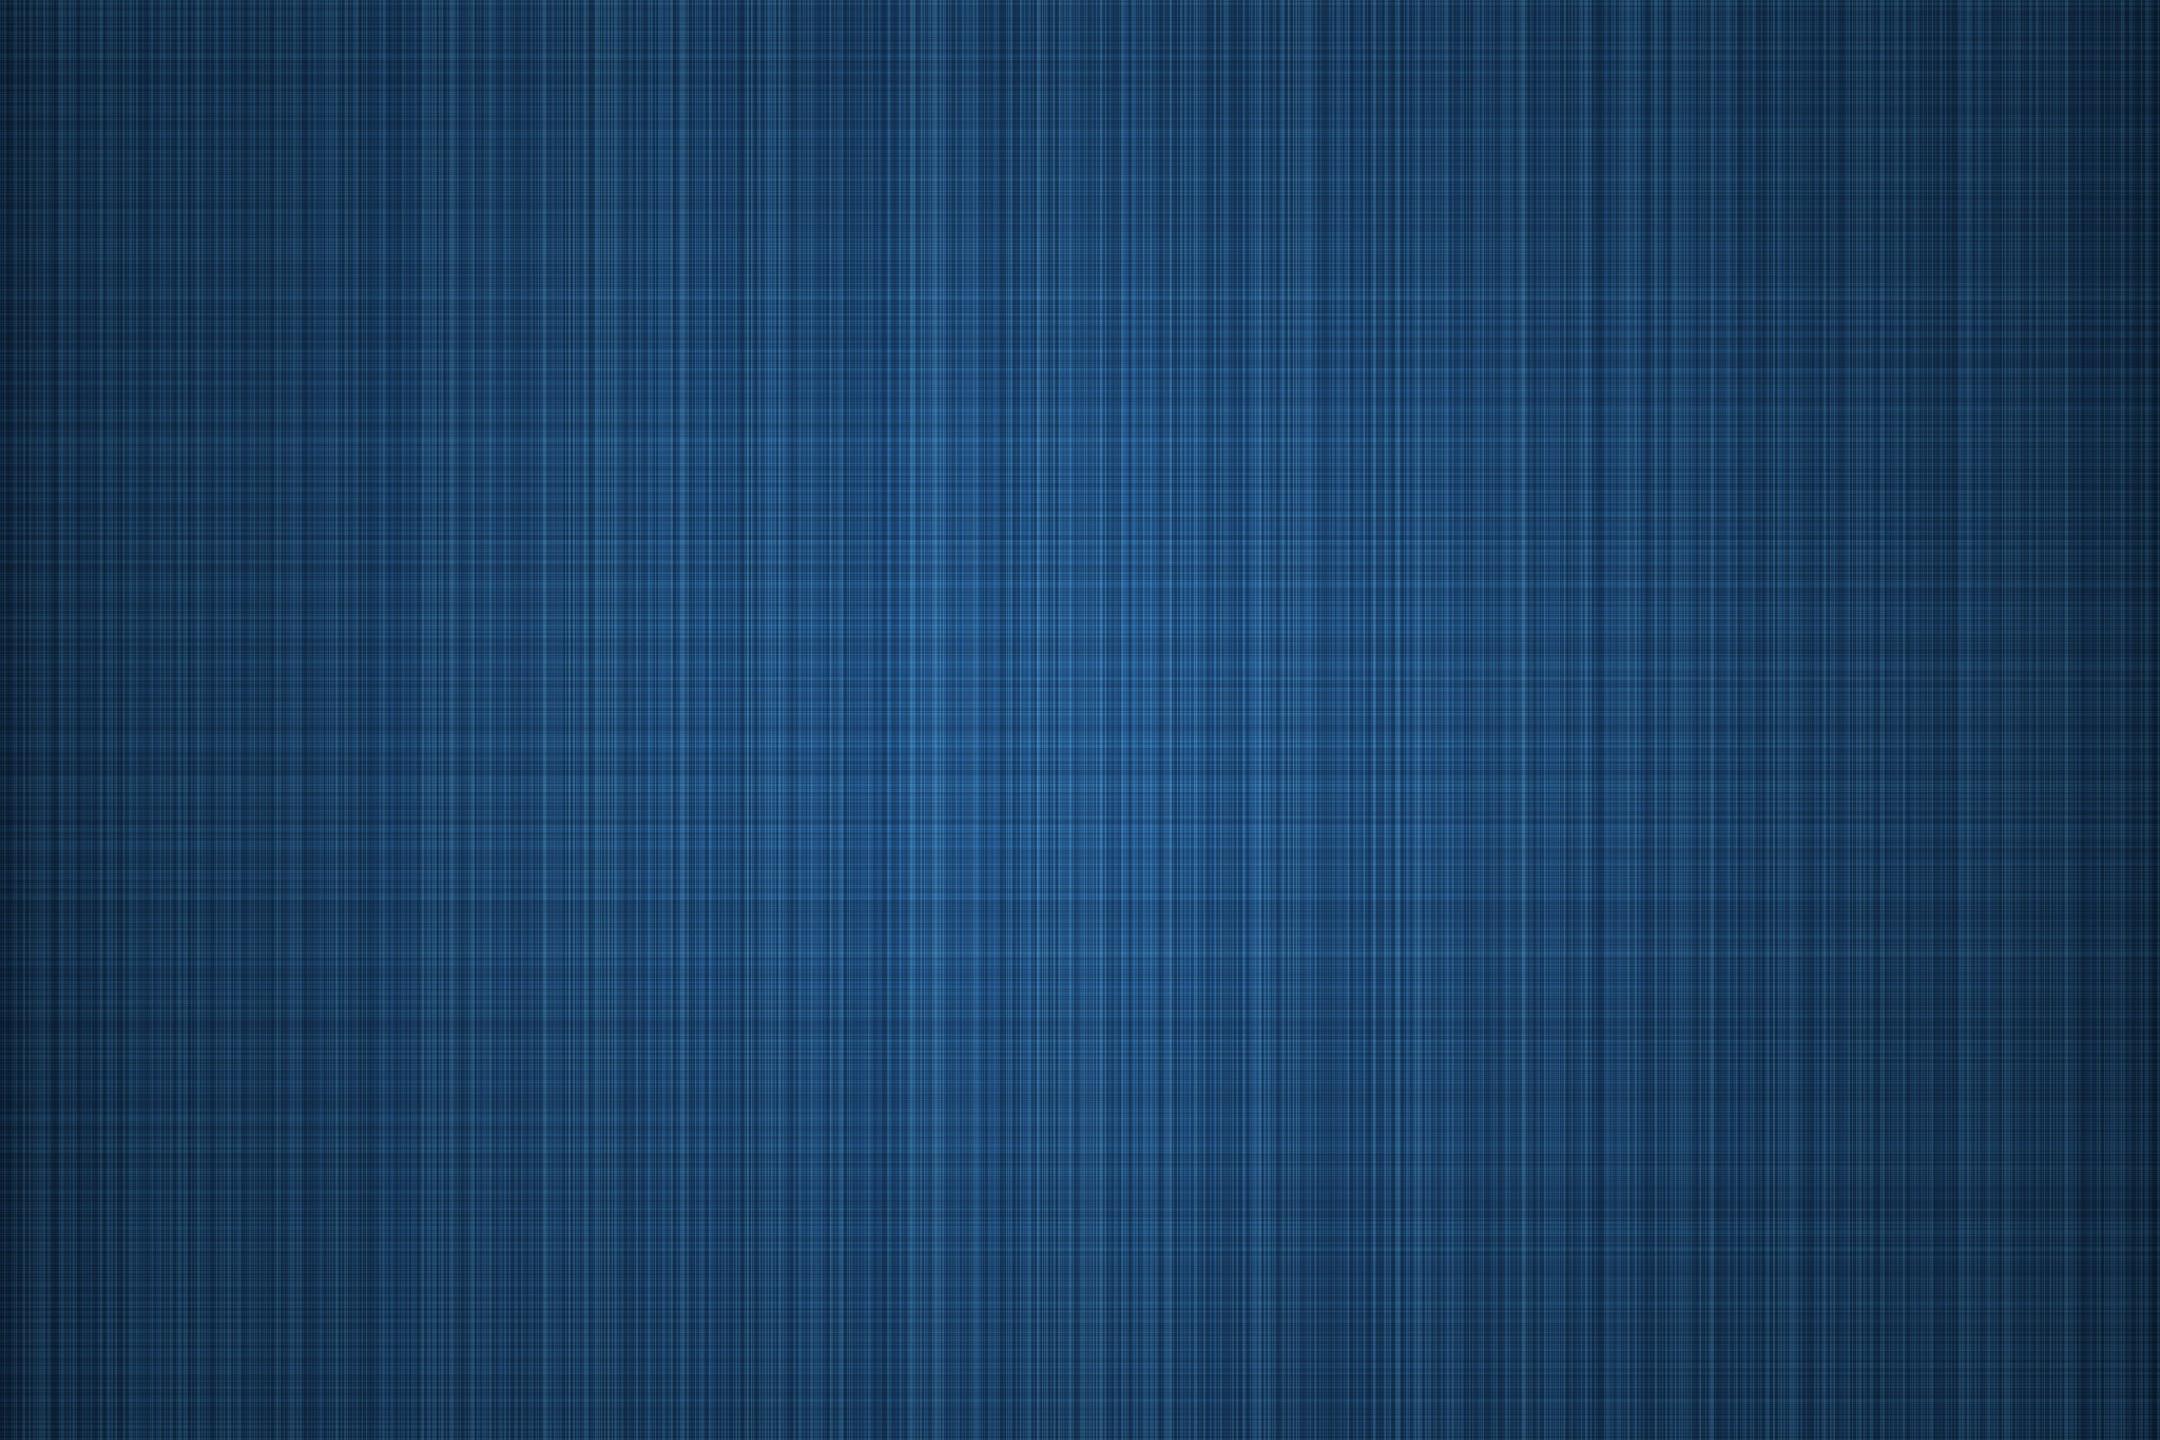 21601440 Wallpaper 01372 PCnet 2160x1440